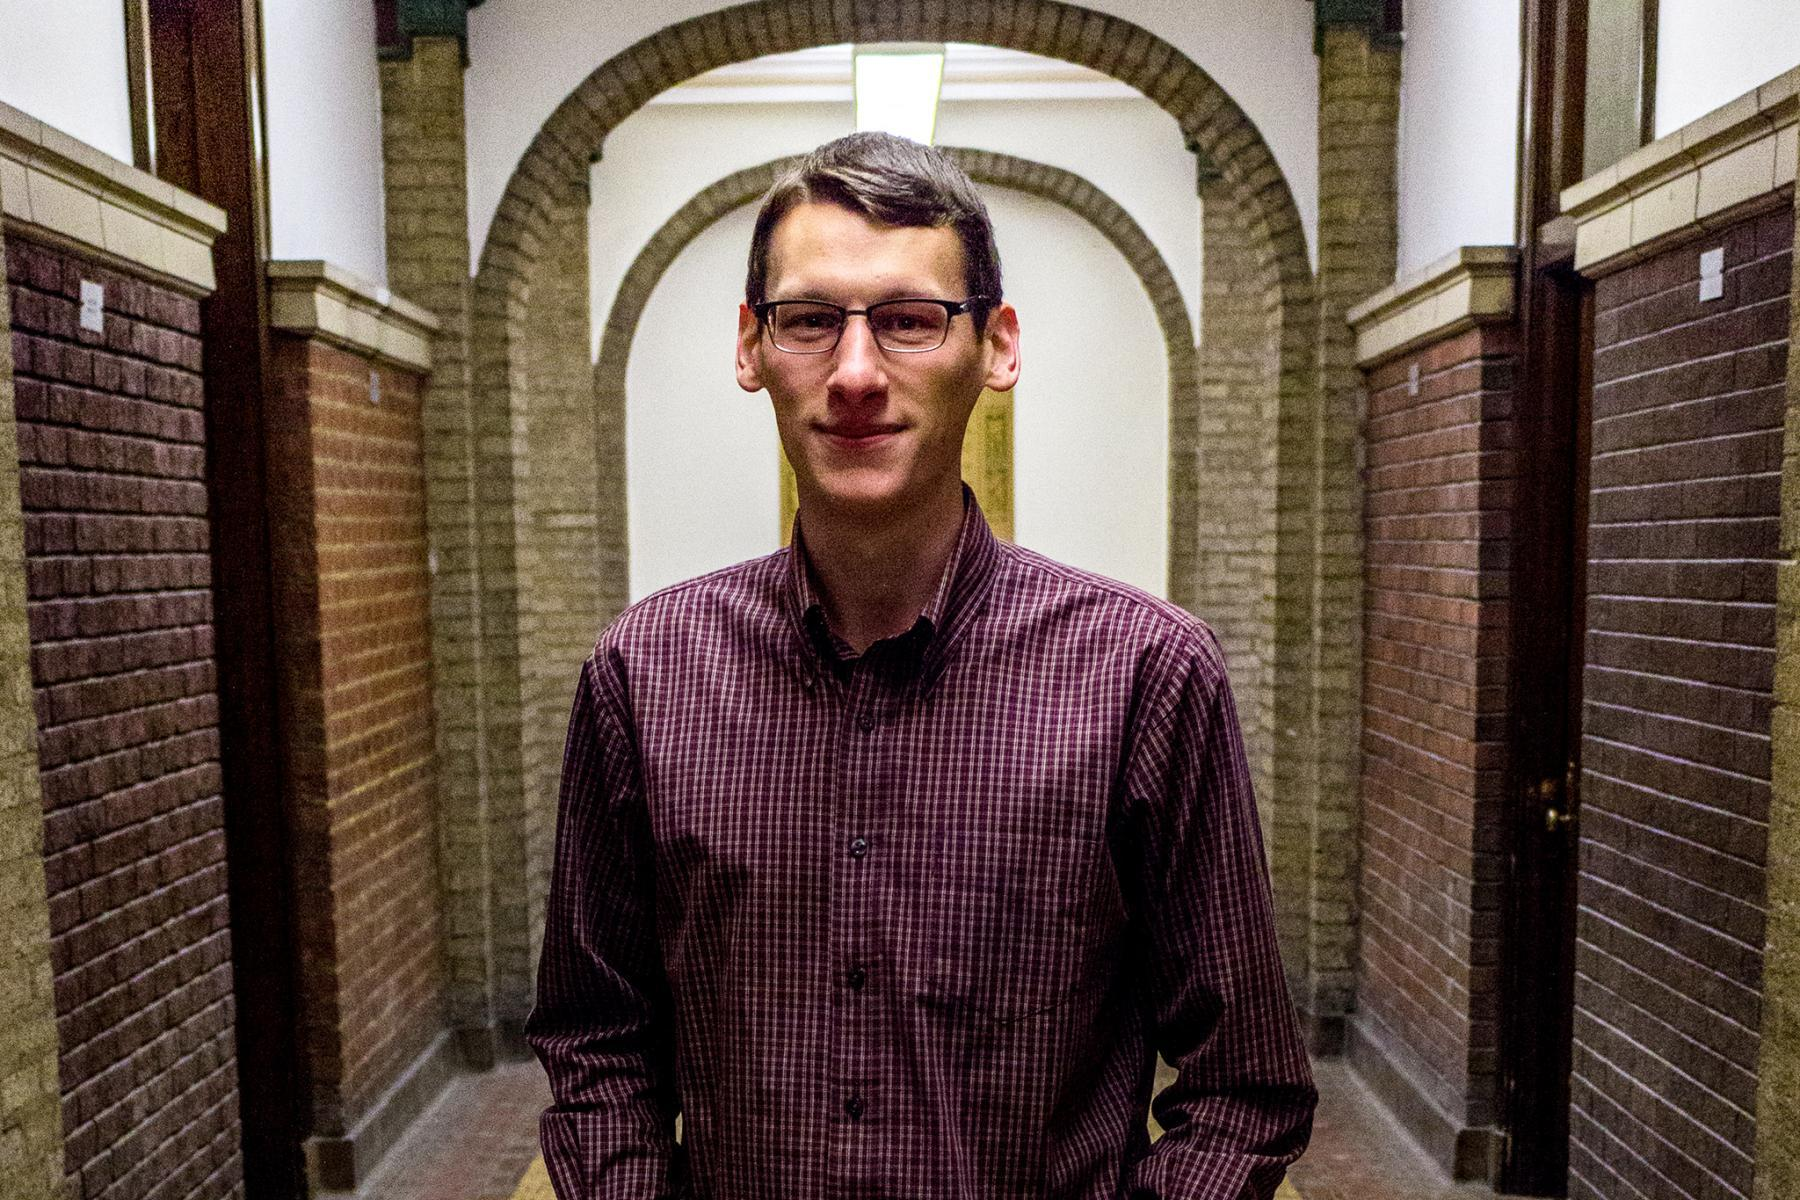 Penn State doctoral student John Shimanek